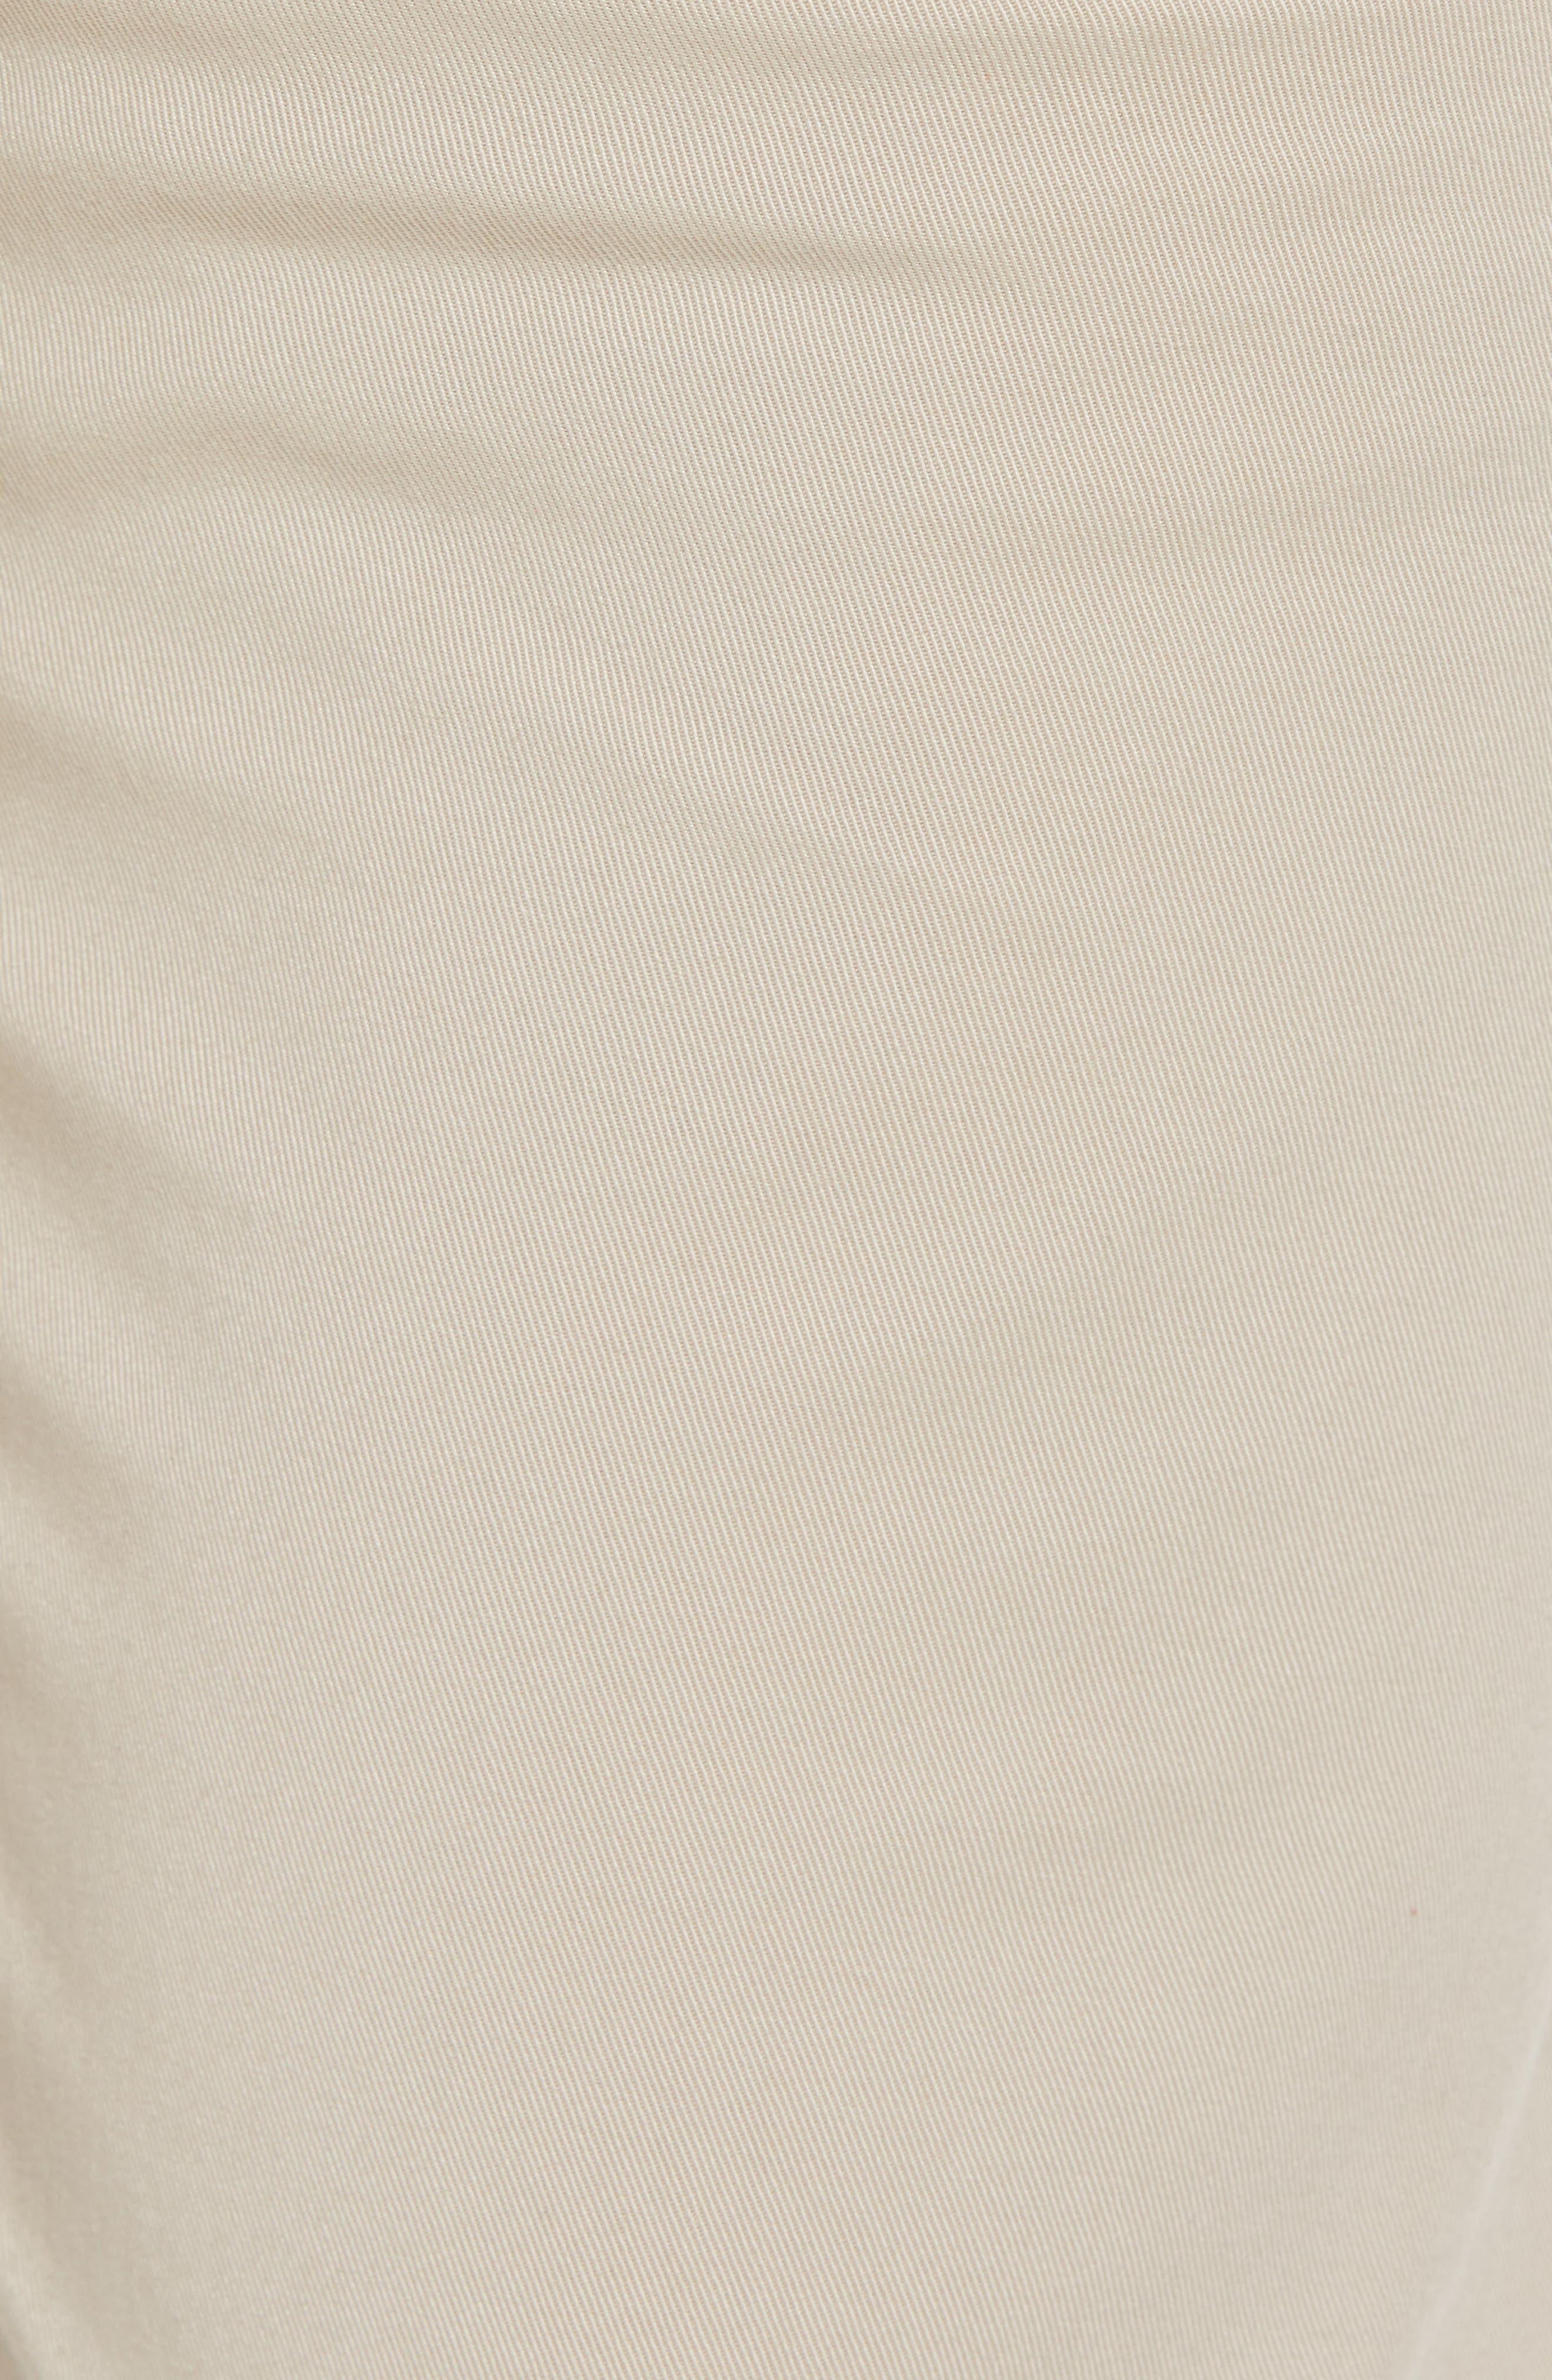 Rice Slim Fit Chino Pants,                             Alternate thumbnail 5, color,                             Brown